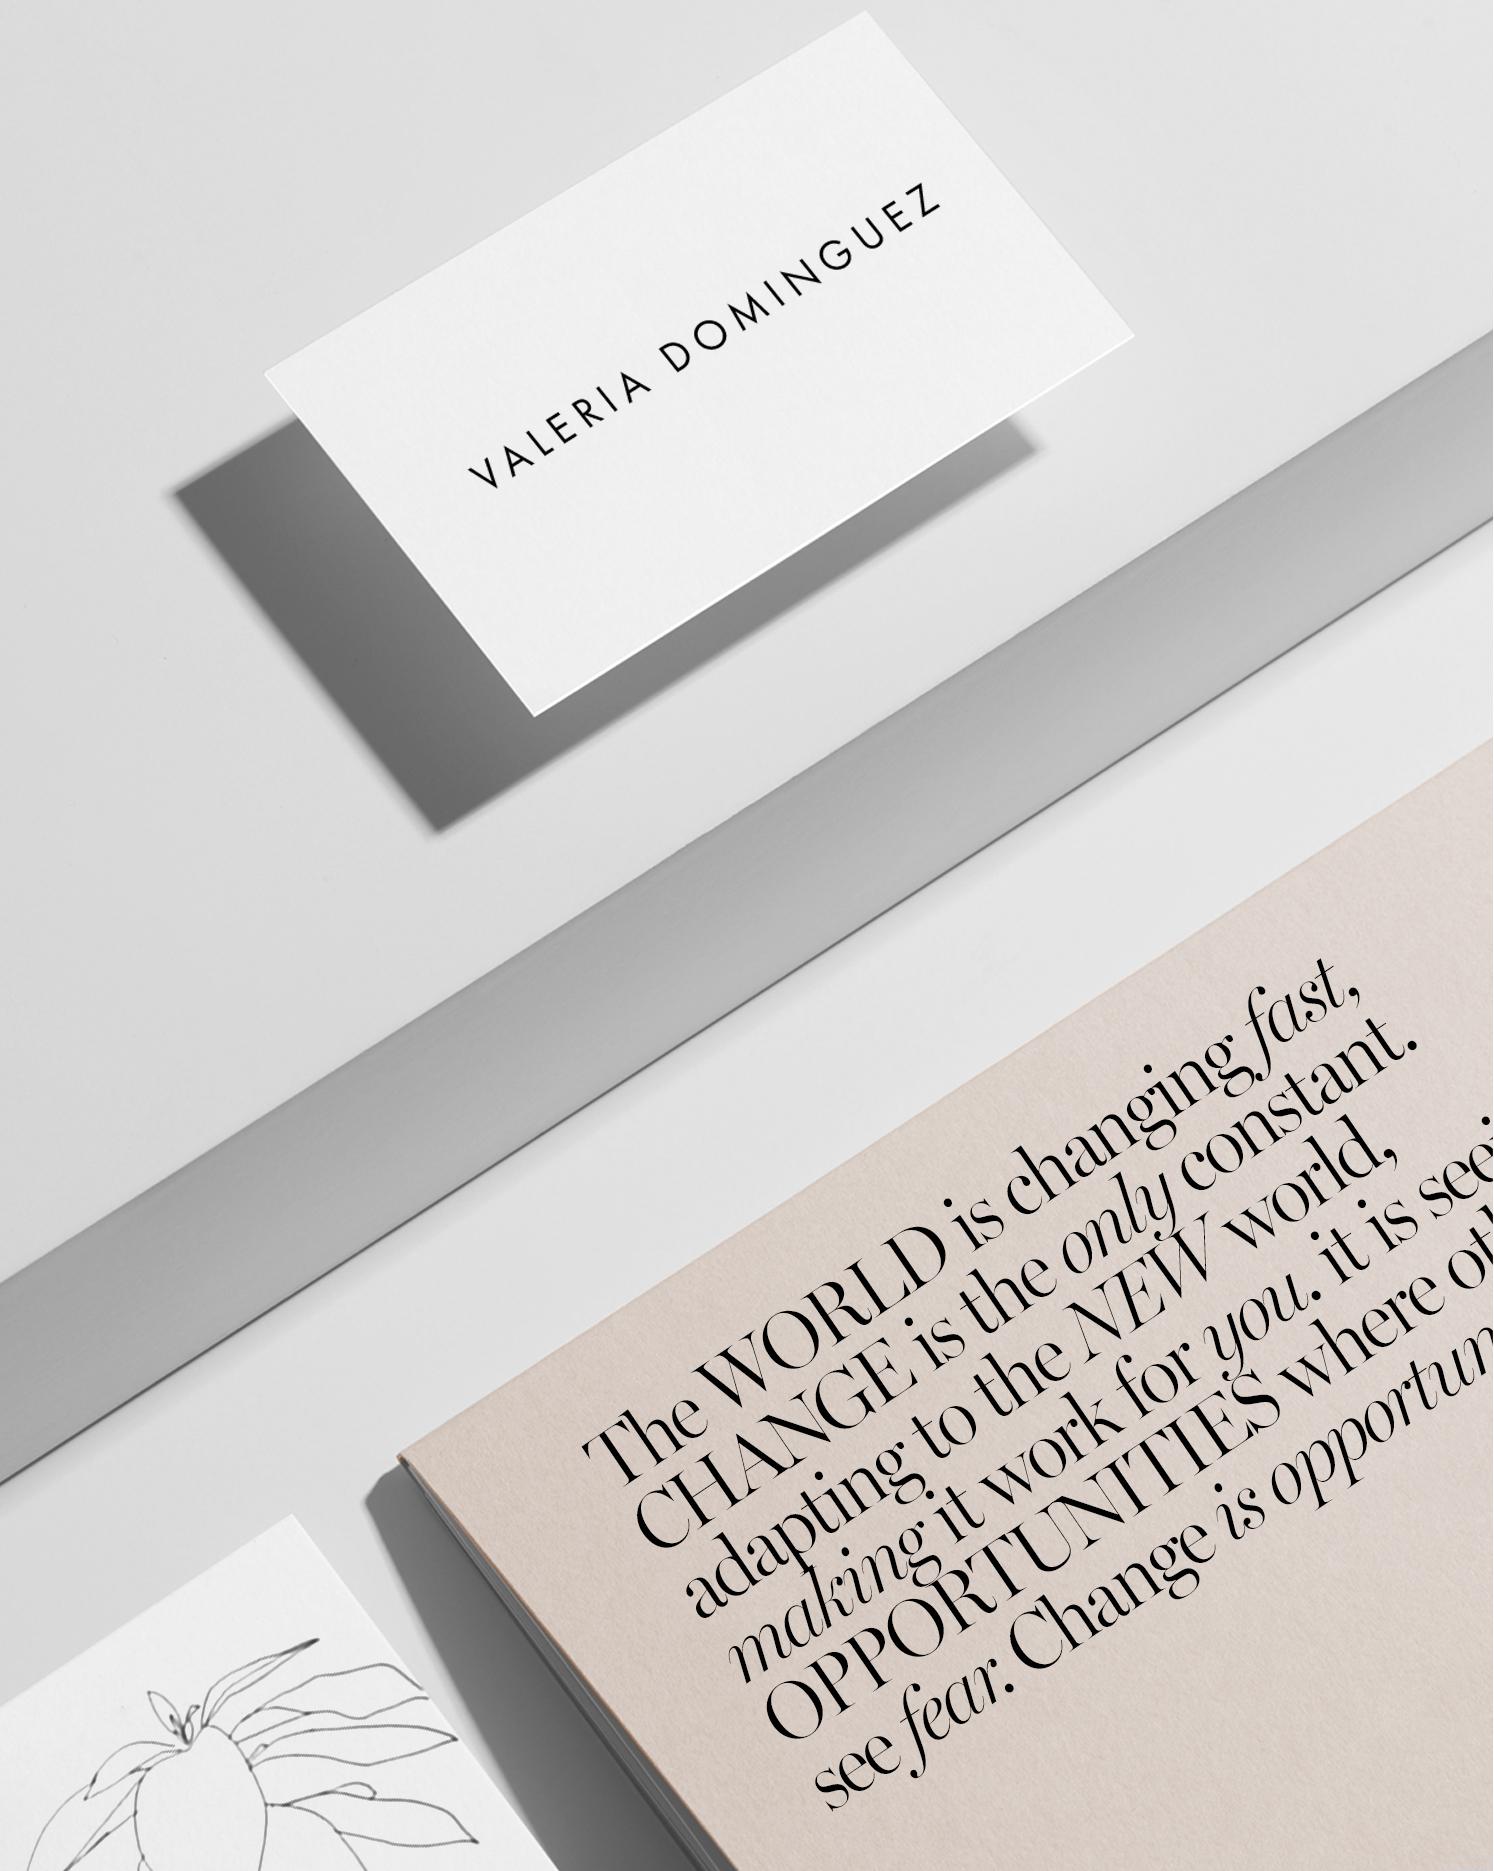 branding-valeria-dominguez-behance-2.jpg